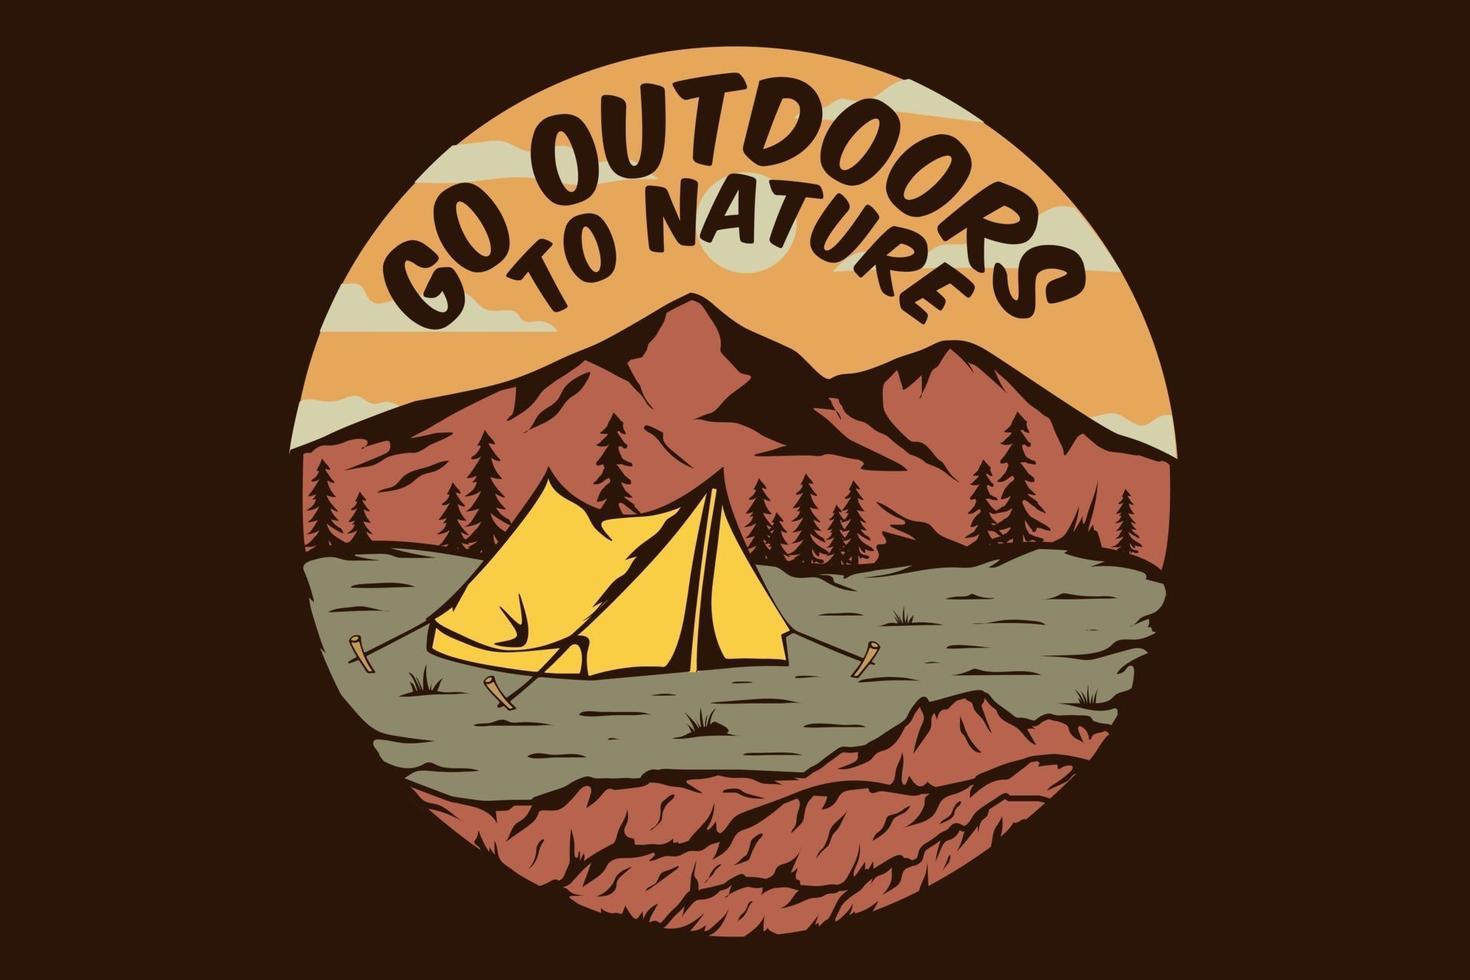 T-shirt outdoors nature camping mountain vector